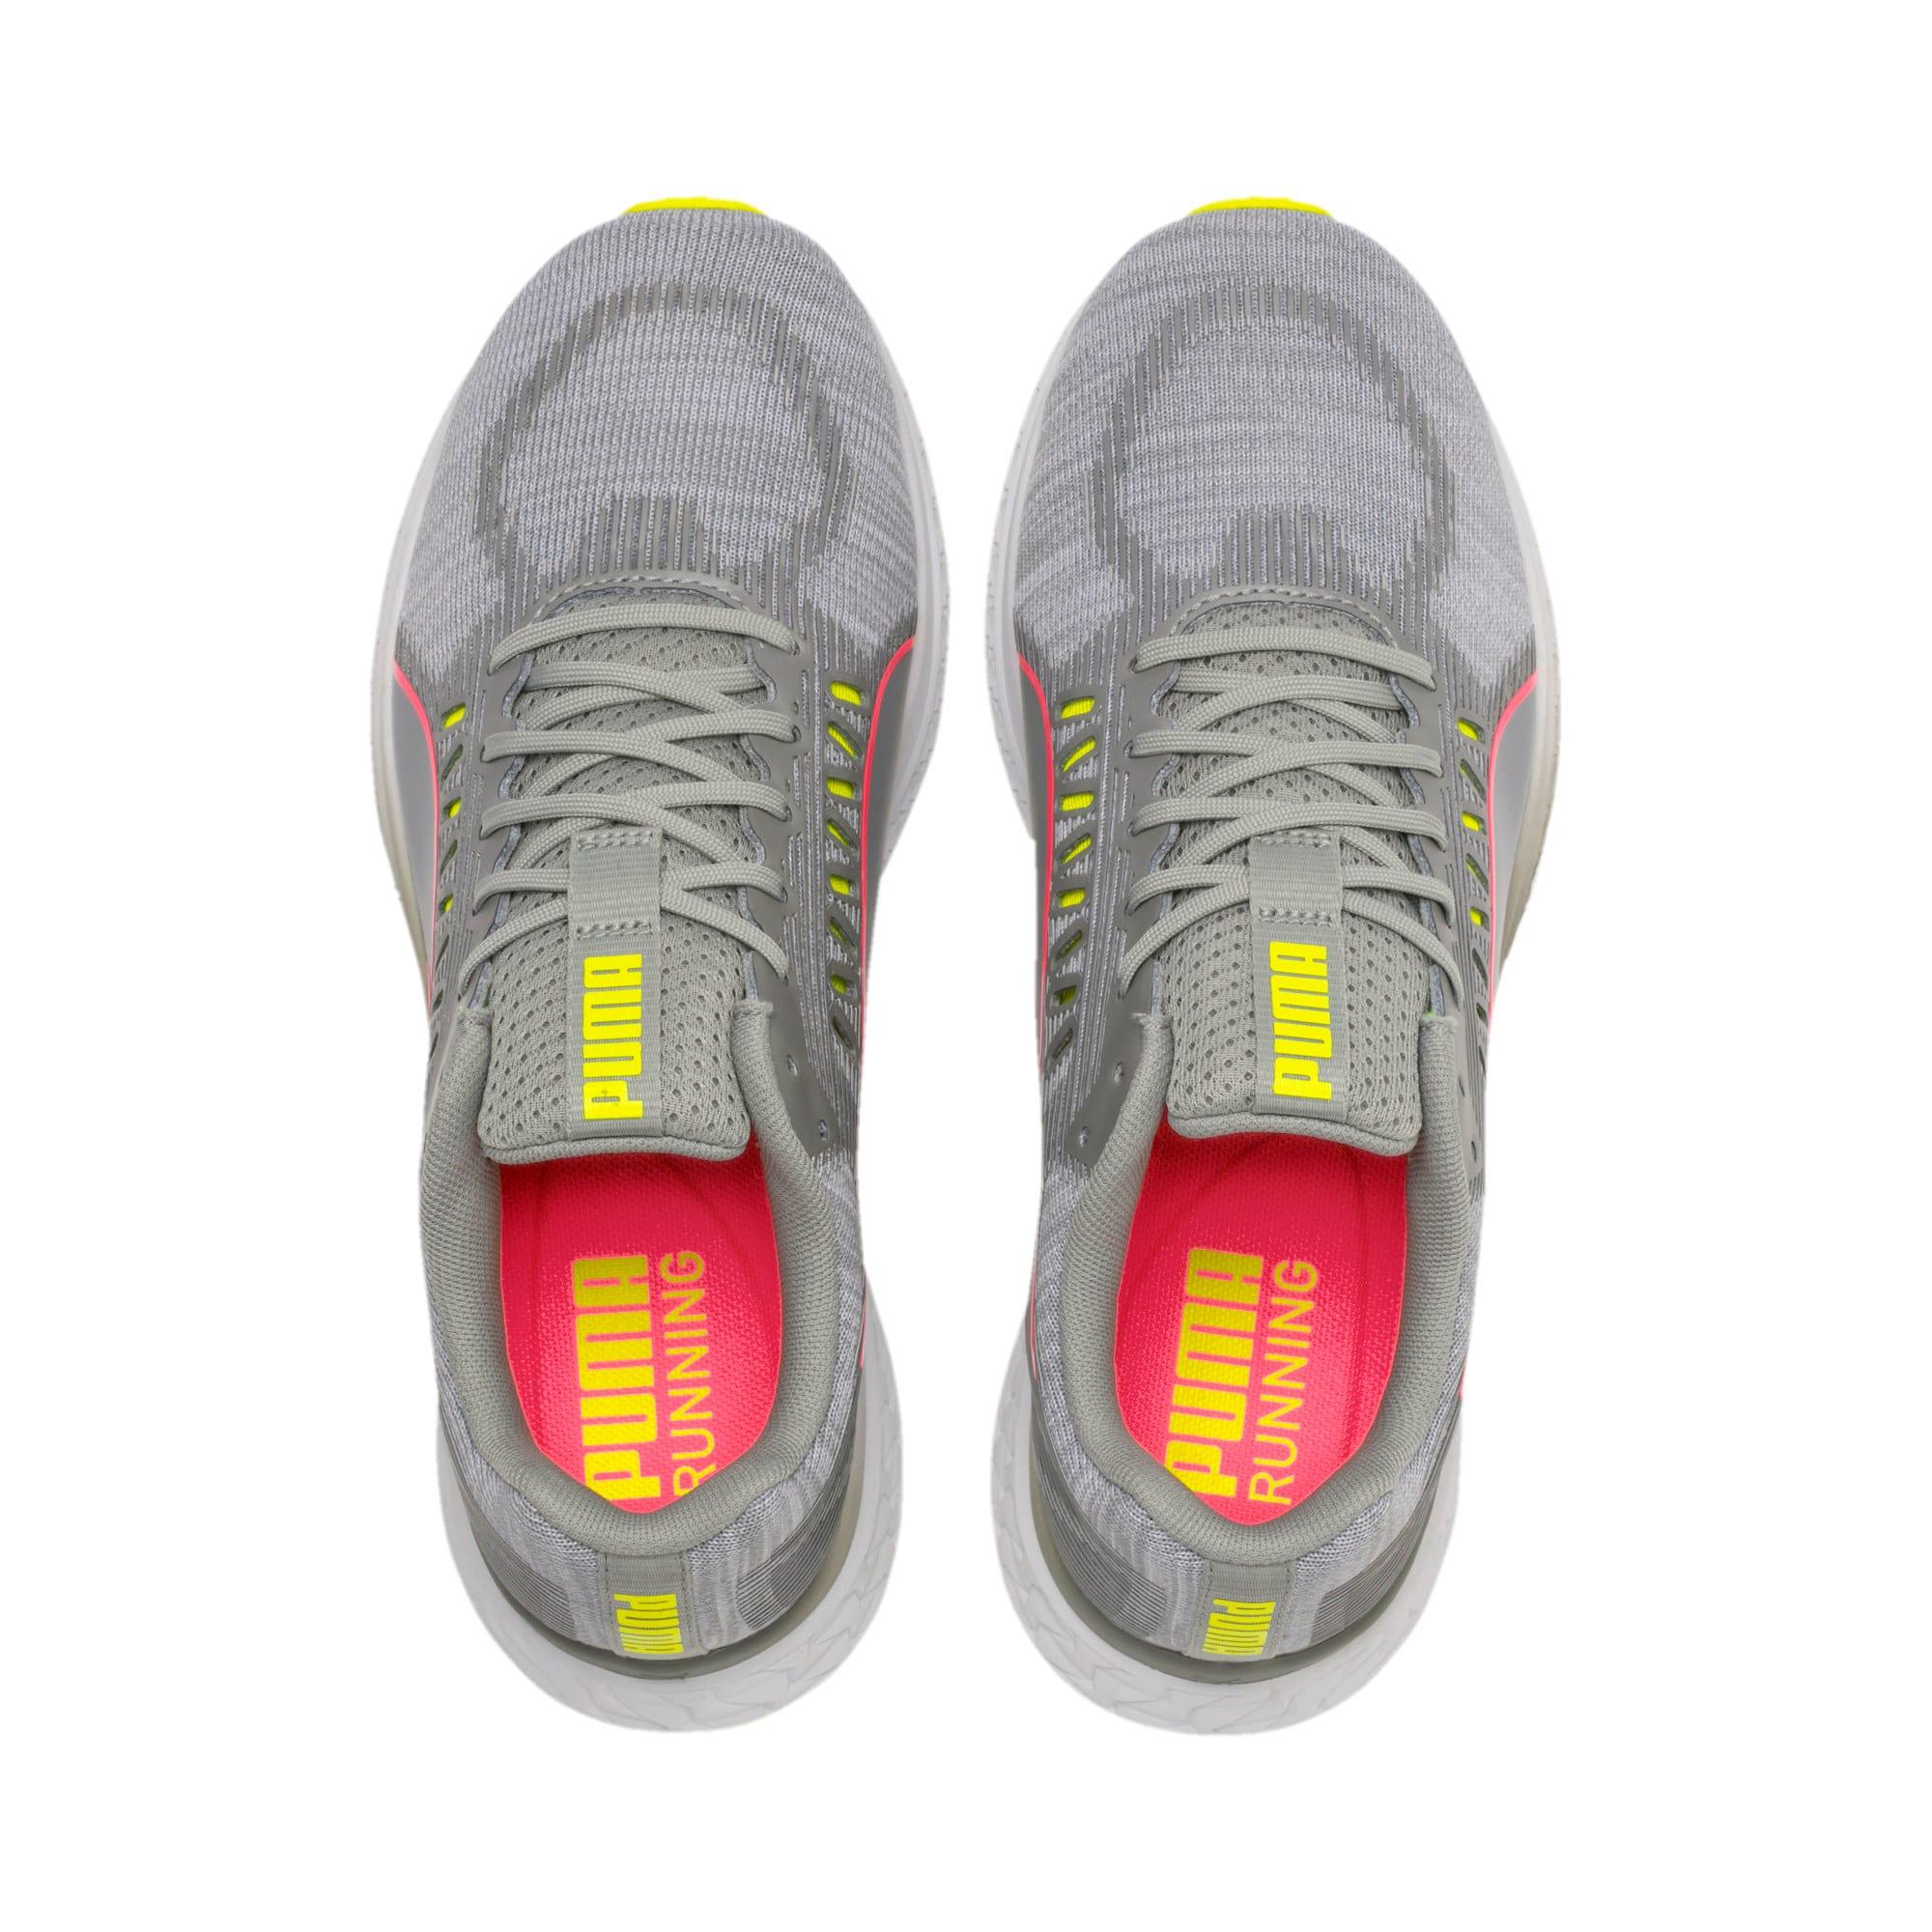 Thumbnail 4 of Speed Sutamina Women's Running Shoes, Quarry-Yellow Alert-Pink, medium-IND